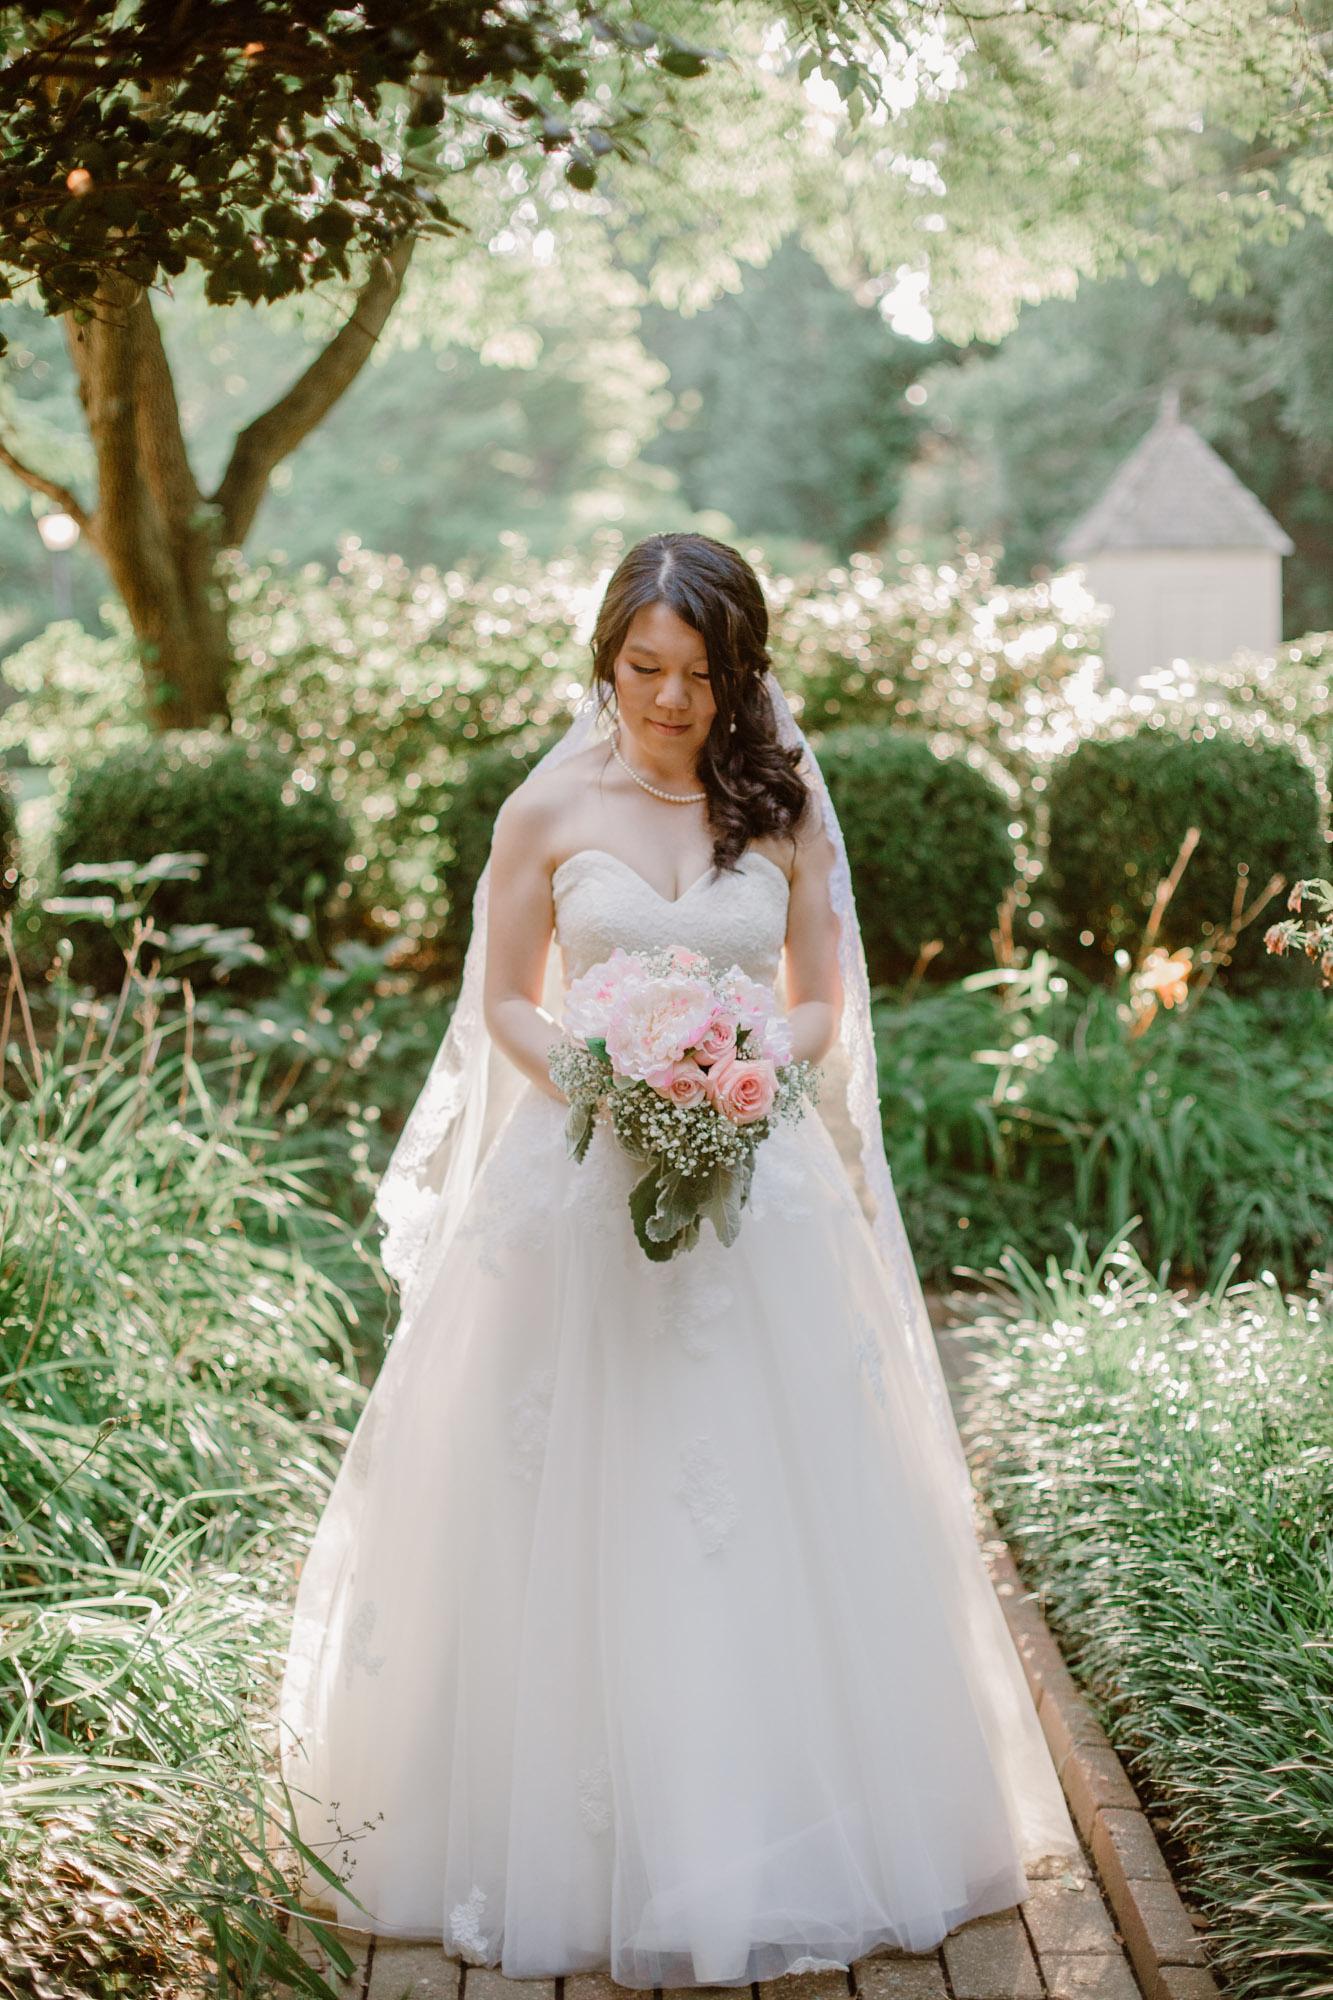 SarahMattozziPhotography-KingsCharter-Wedding-48.jpg